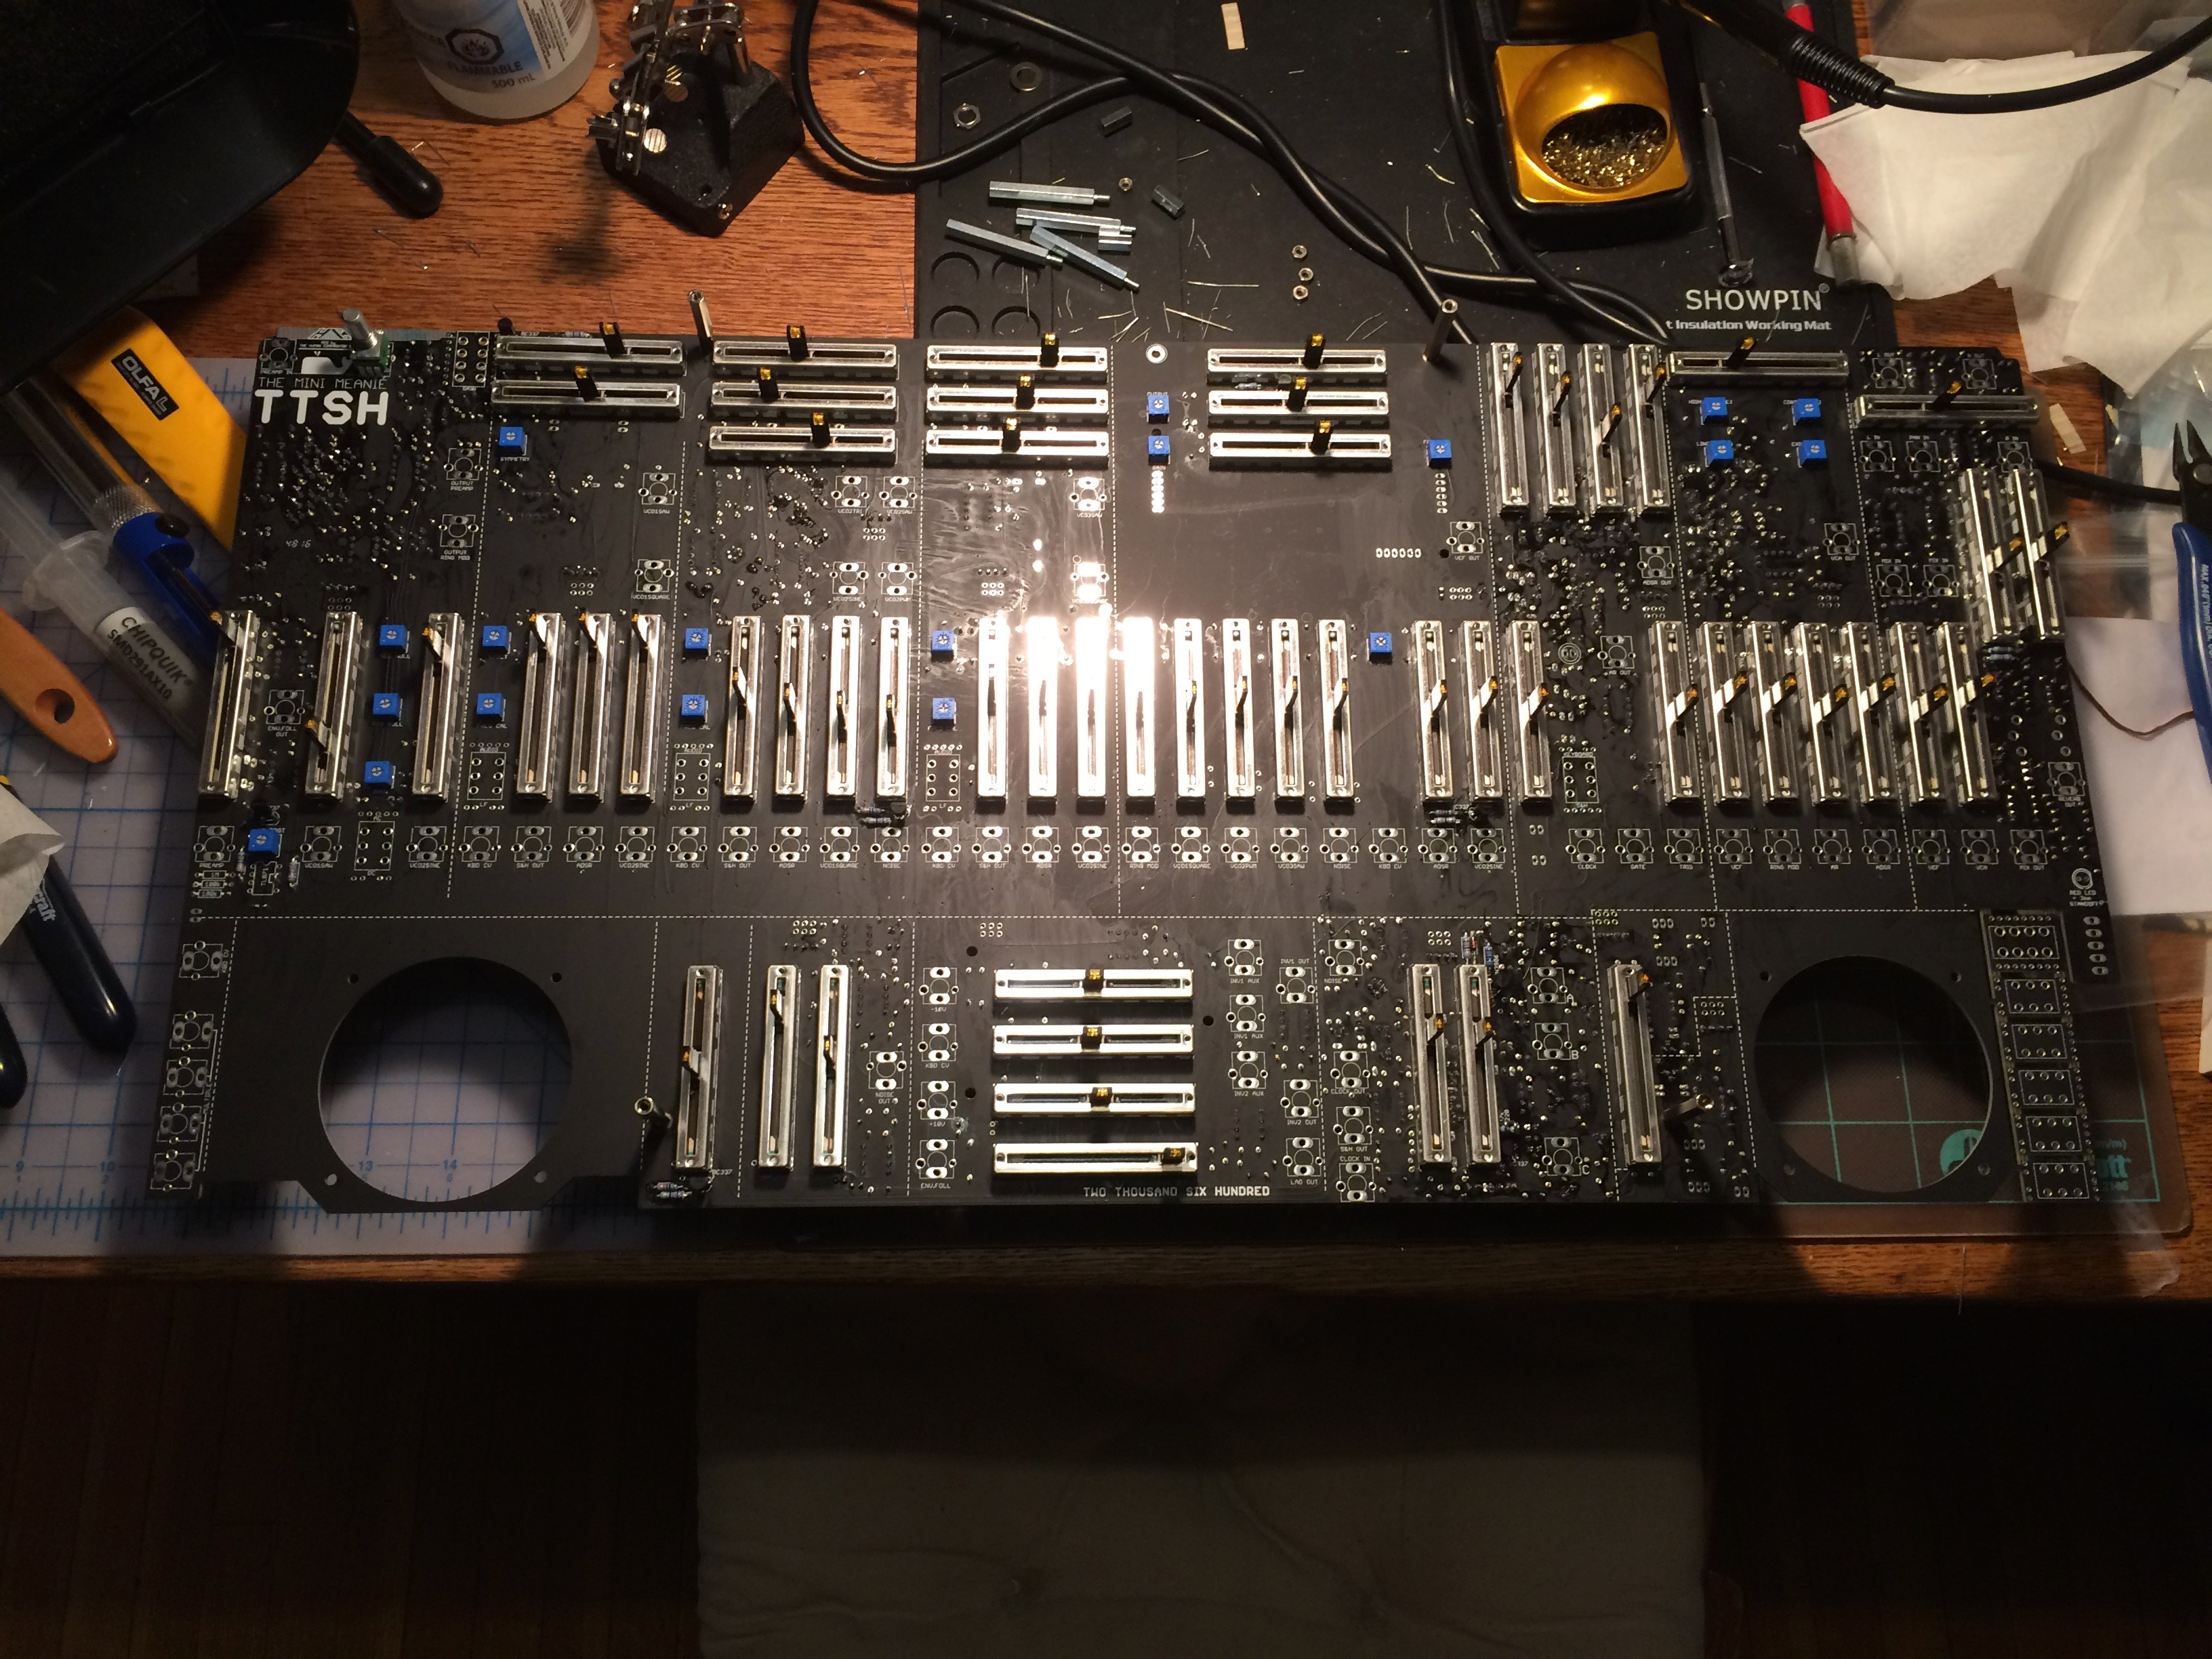 TTSH mainboard with sliders